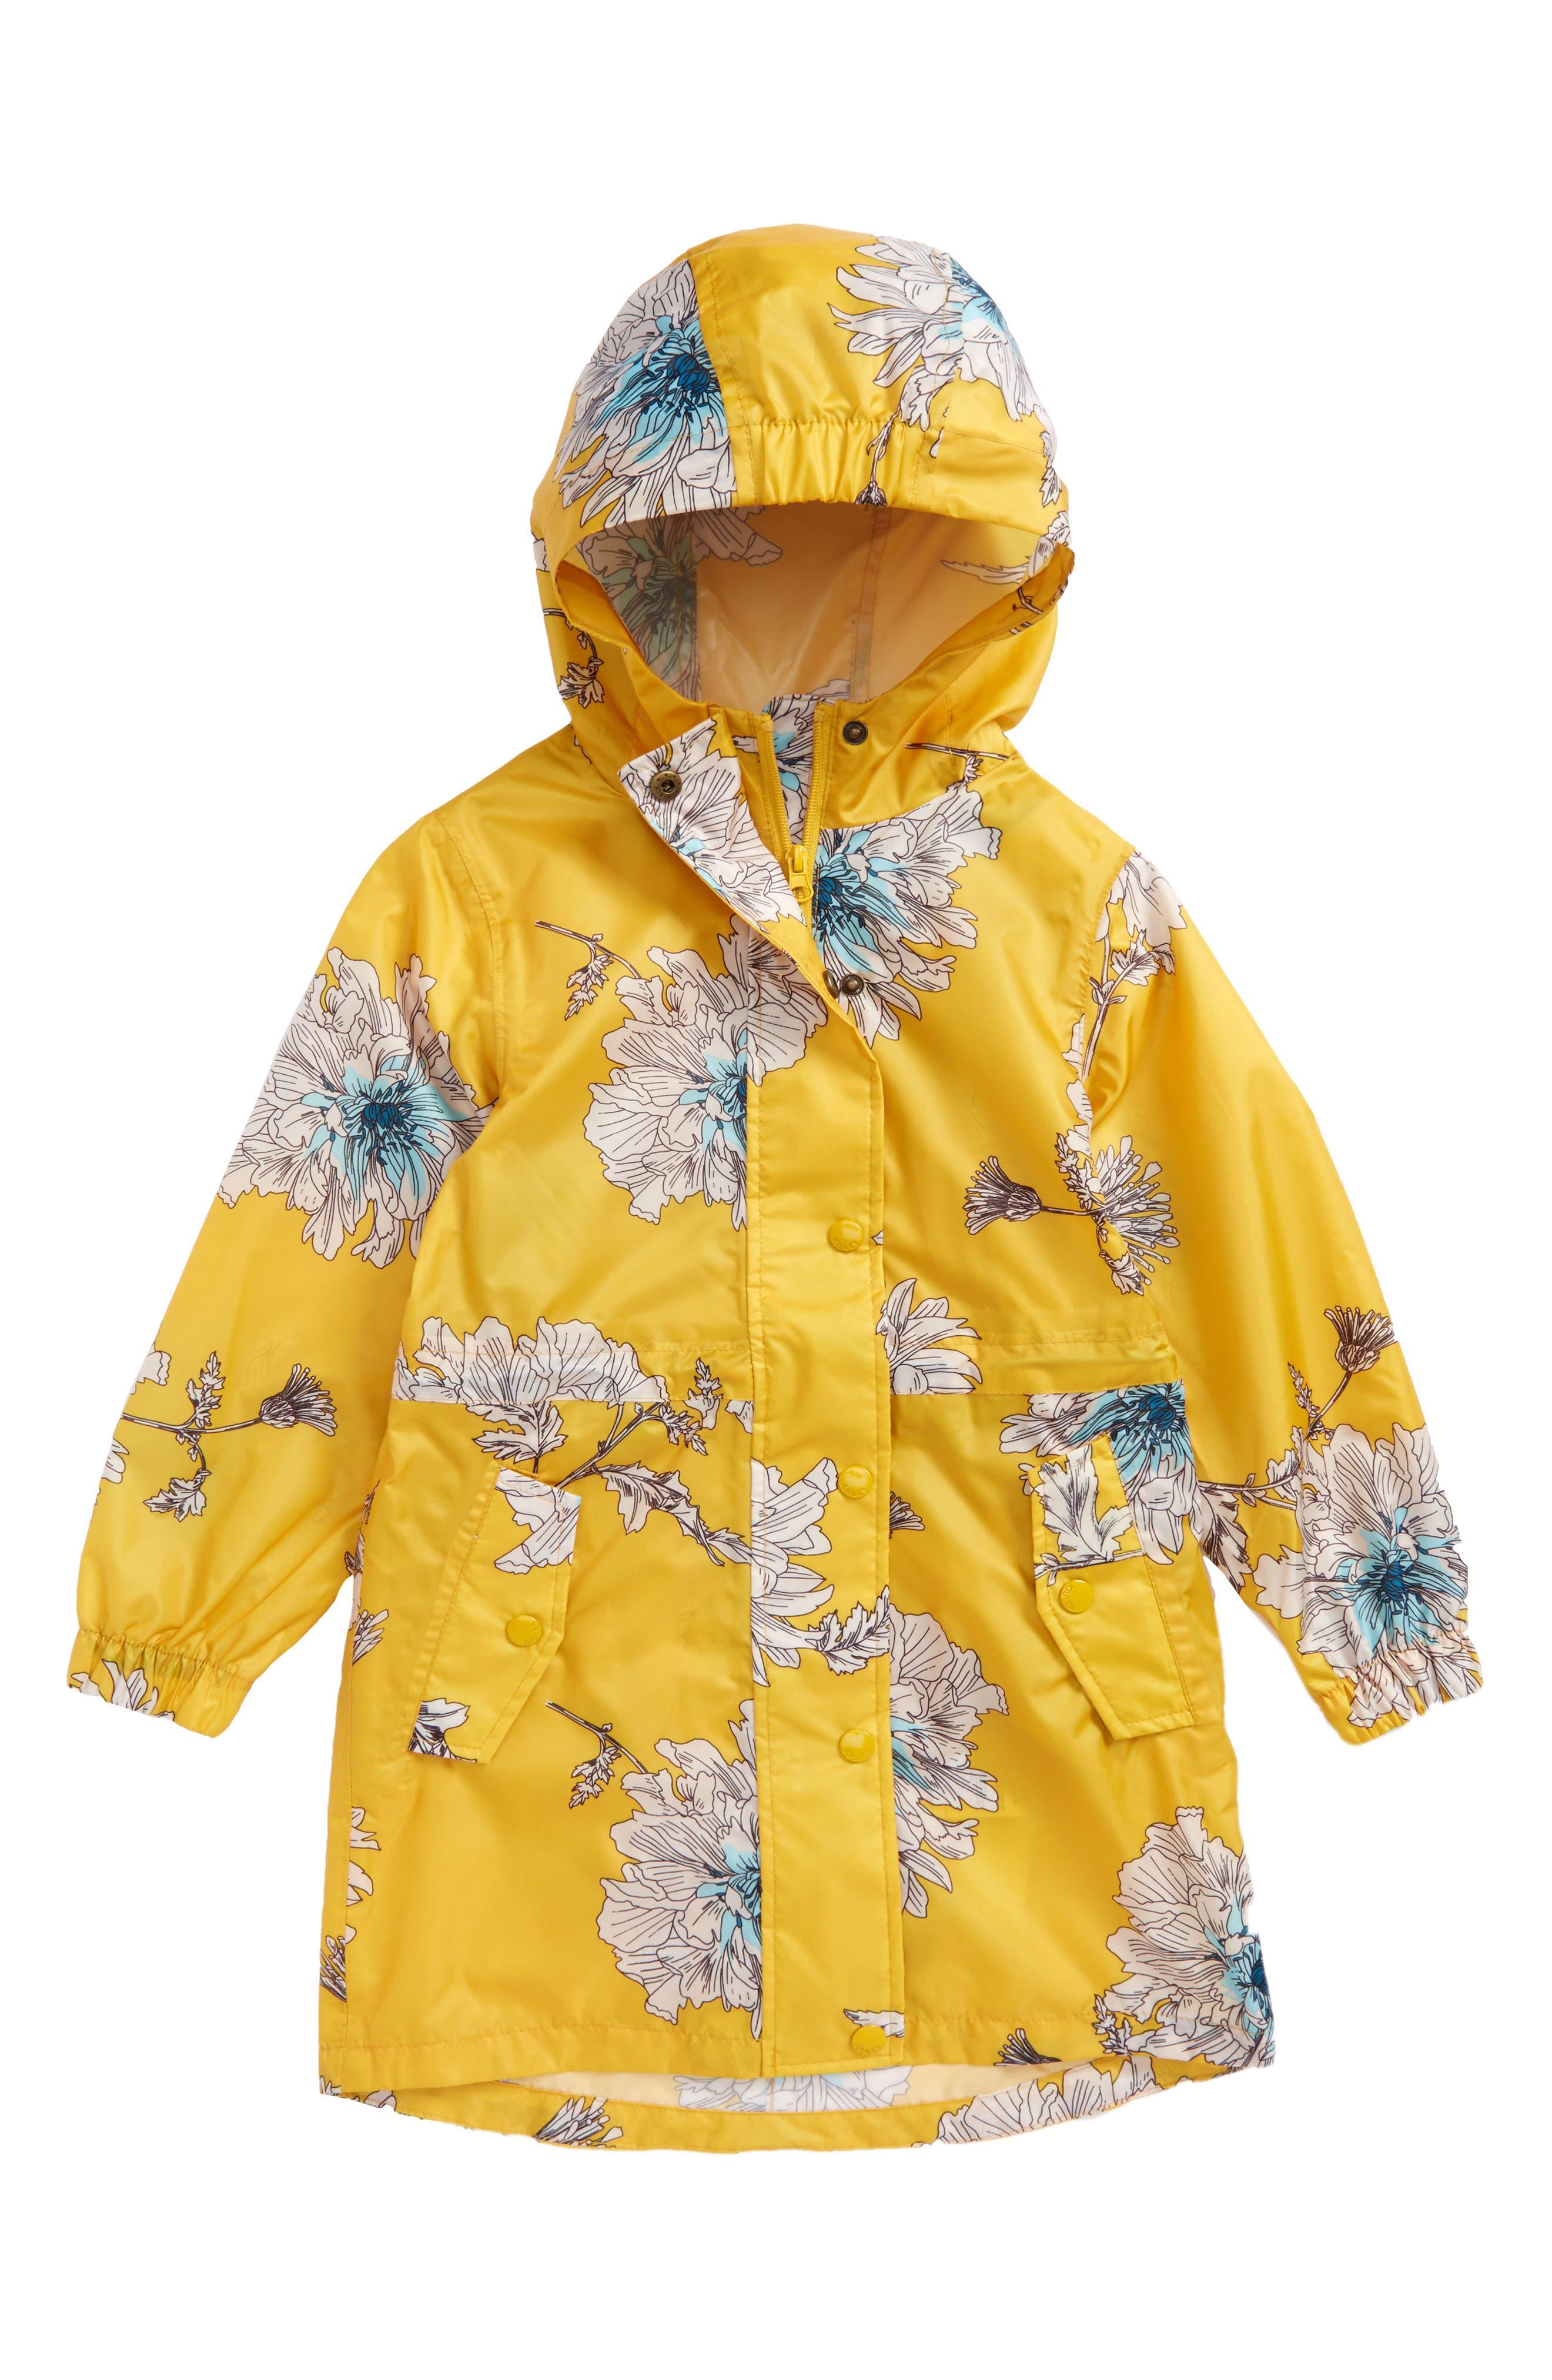 Packaway Flower Print Rain Jacket,                             Main thumbnail 1, color,                             Antique Gold Peony